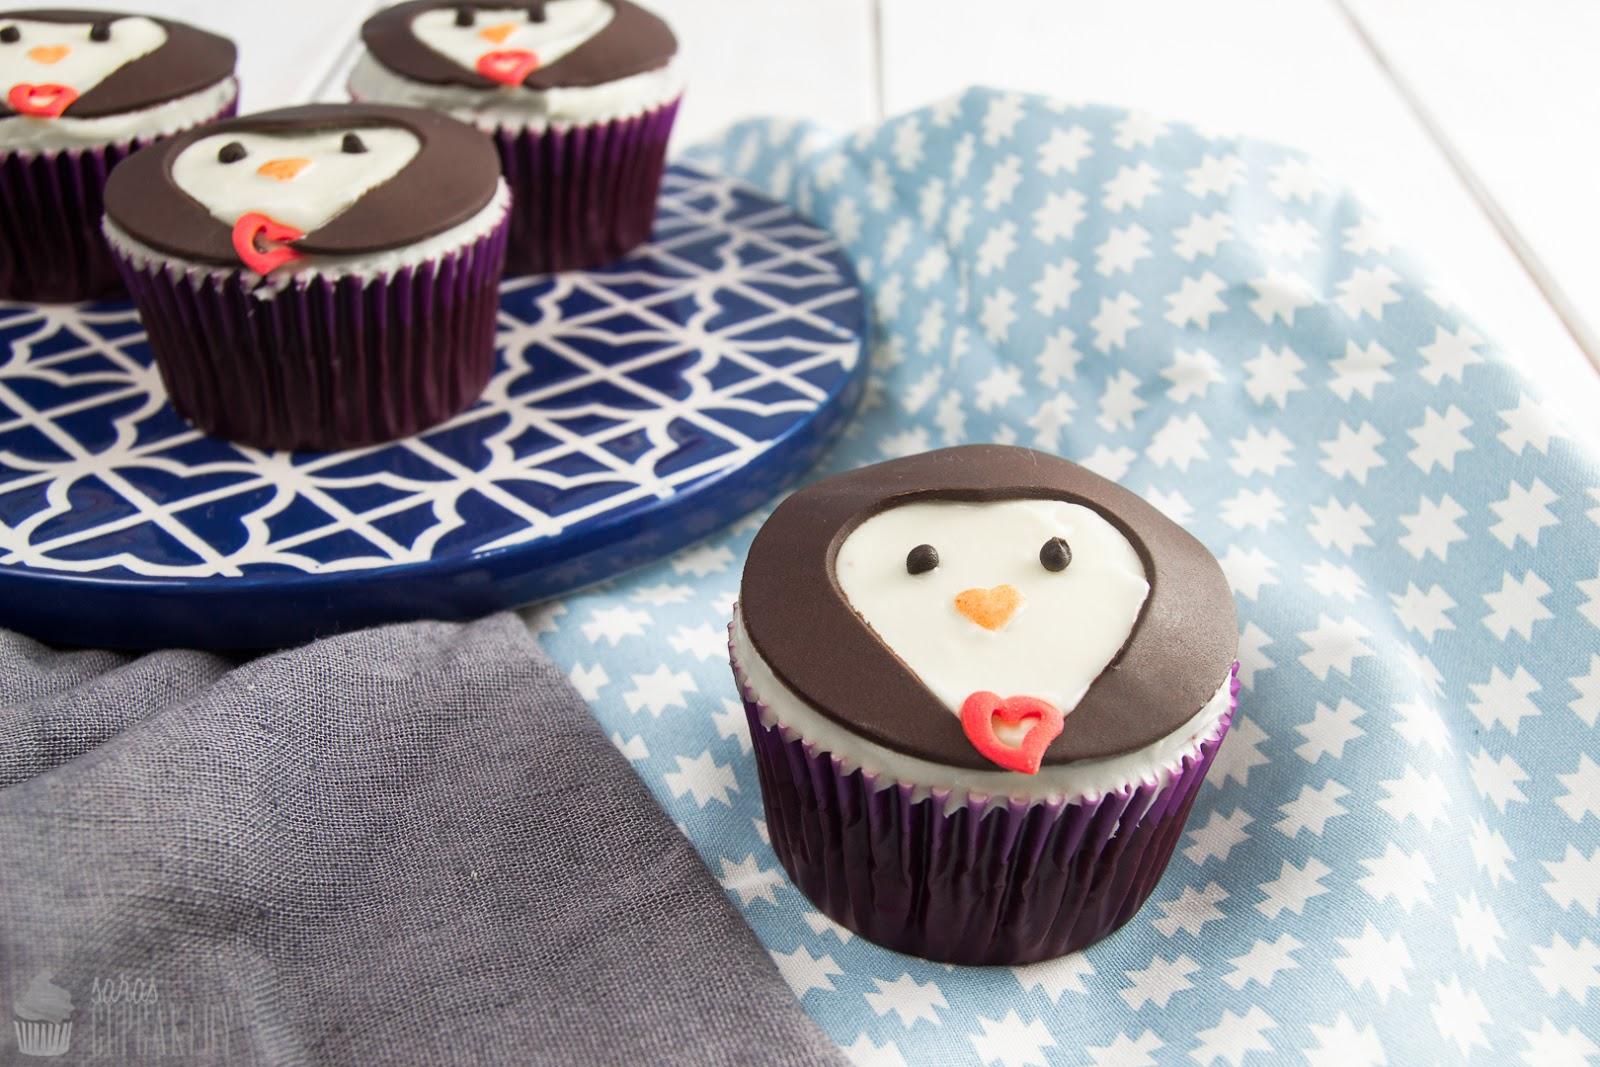 saras cupcakery s e pinguine zum valentinstag red velvet cupcakes. Black Bedroom Furniture Sets. Home Design Ideas